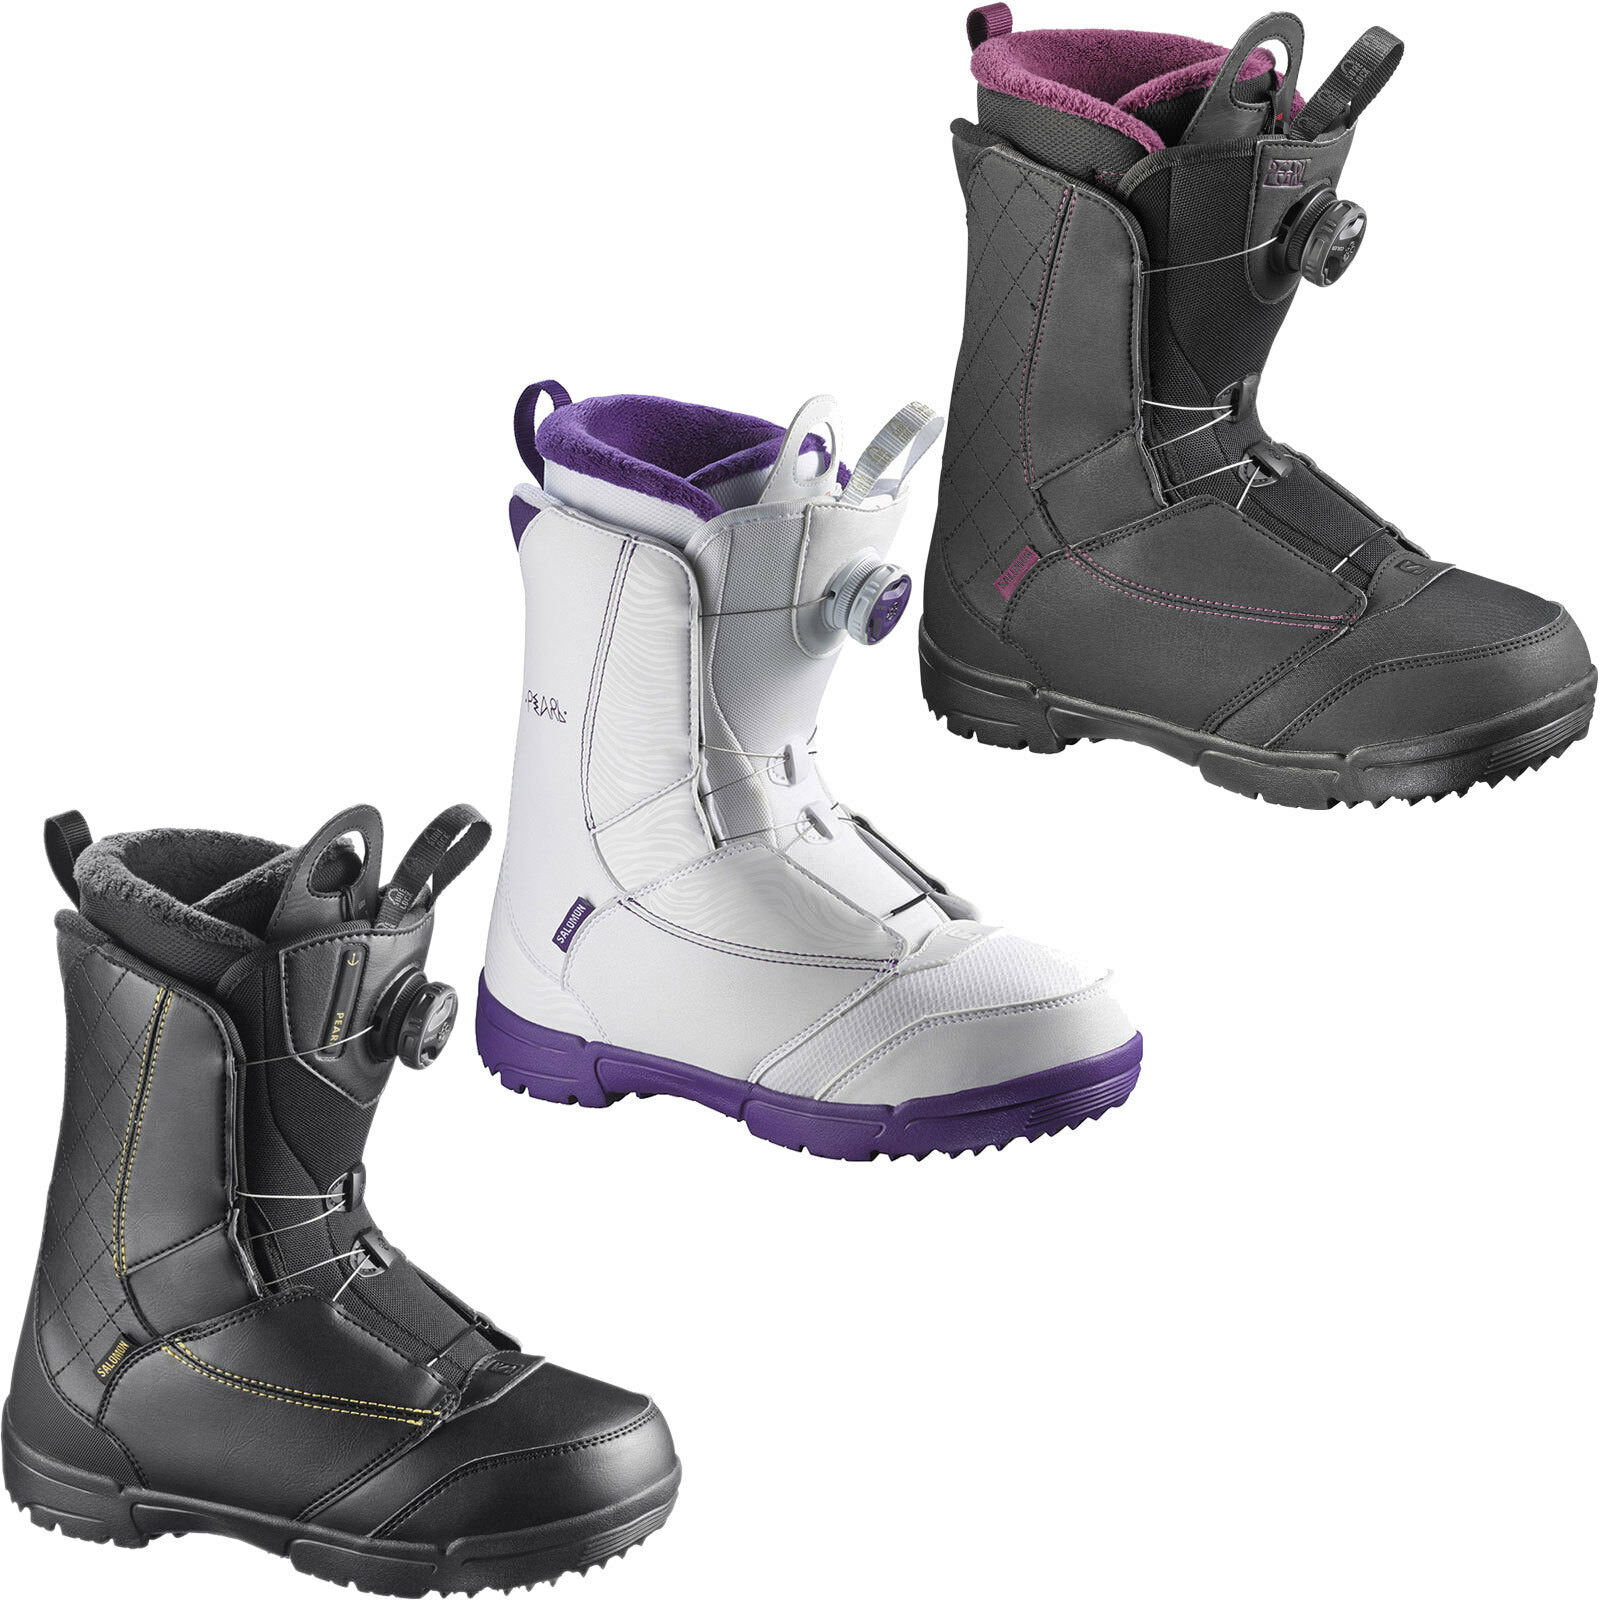 Salomon PEARL BOA Womens  Snowboard Boots Snowboard shoes Snowboard Boots New  cheaper prices